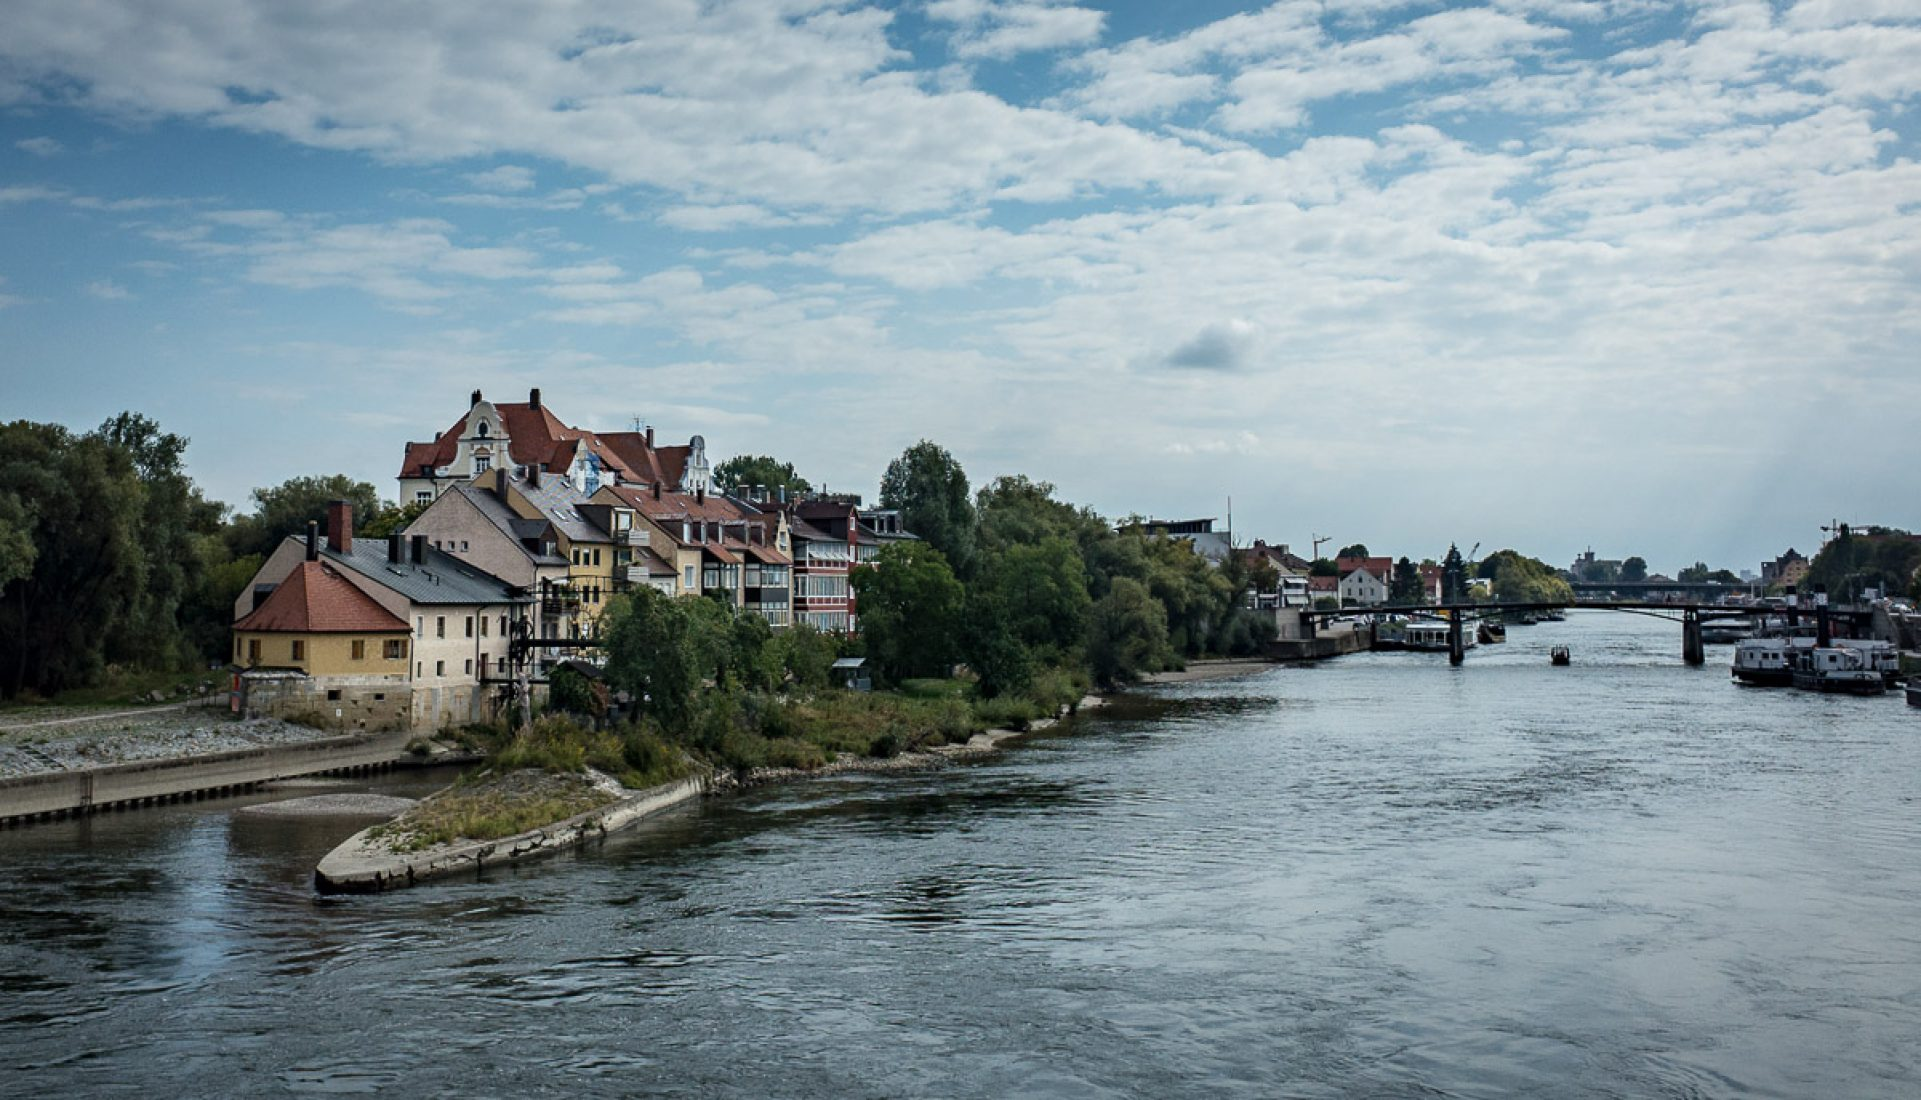 Postcard from Regensburg, Germany